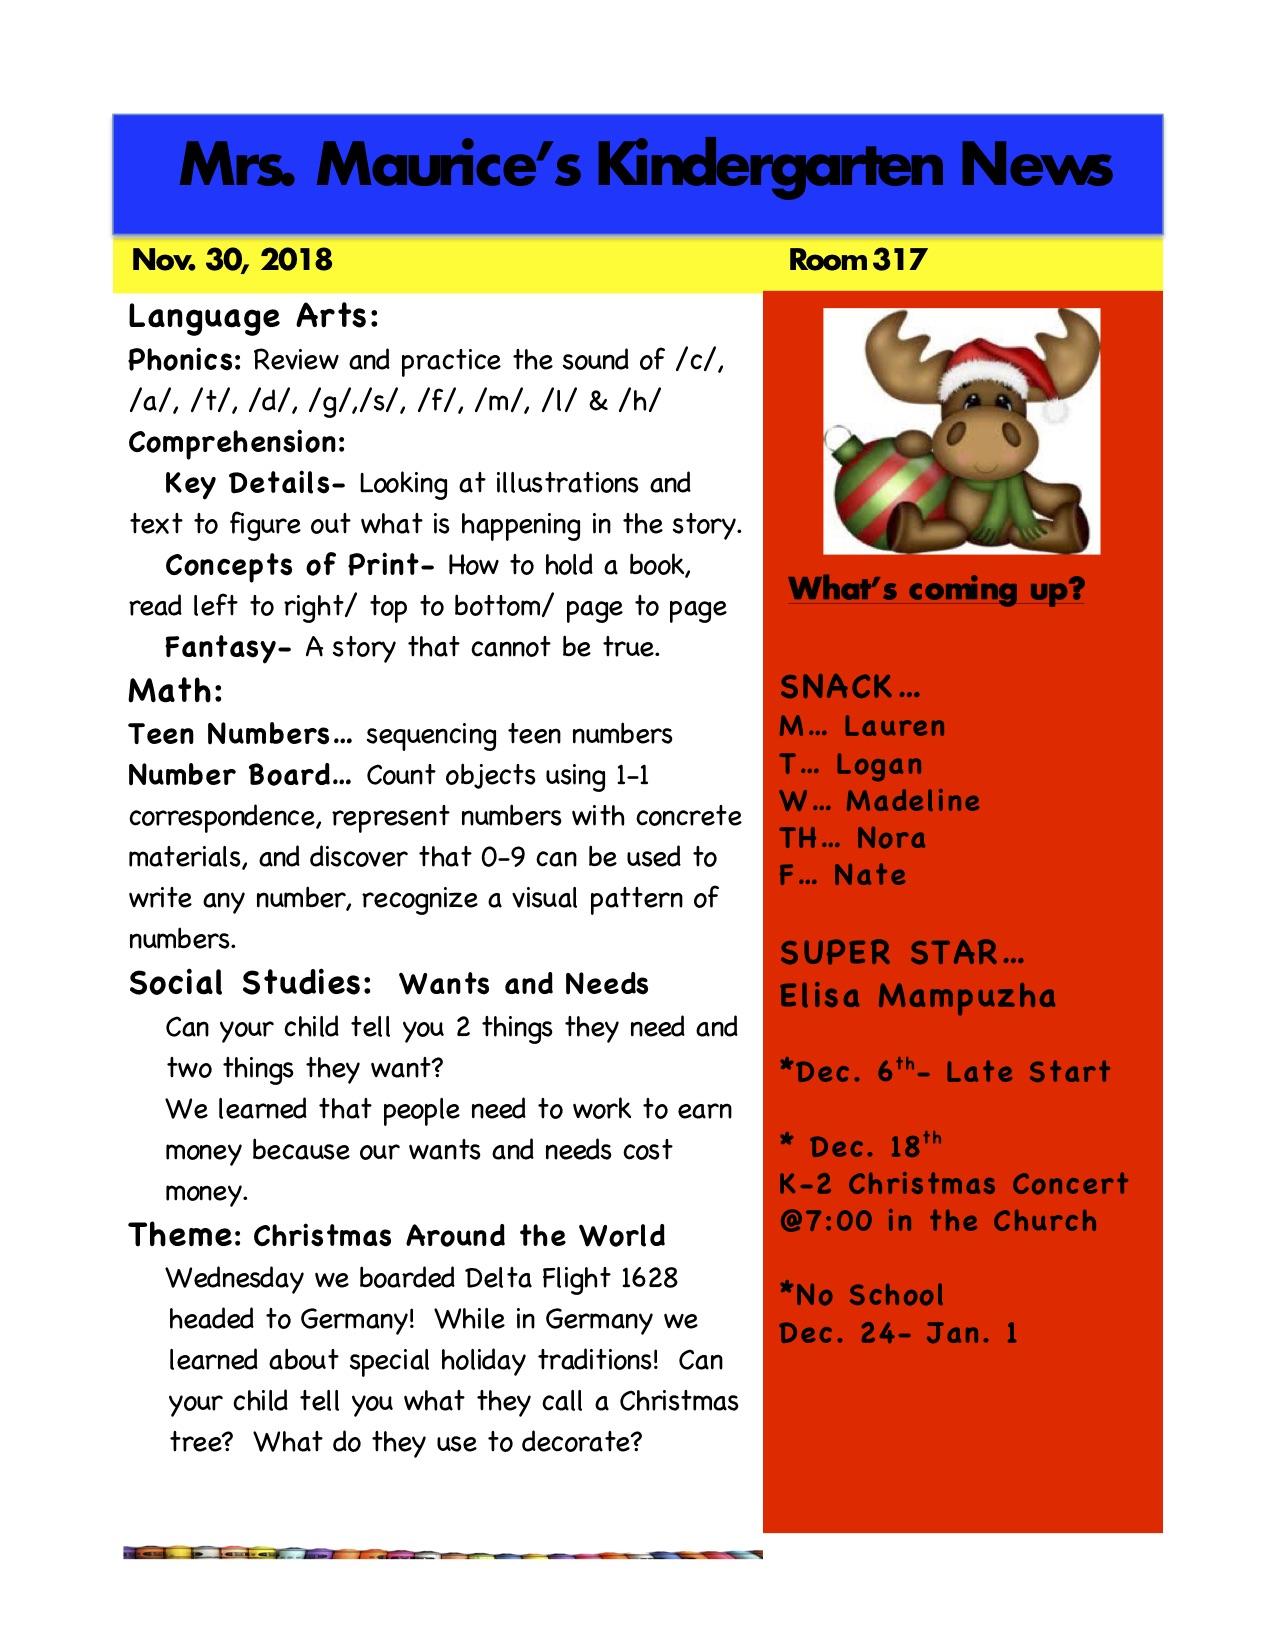 Kindergarten News Nov. 30.jpg